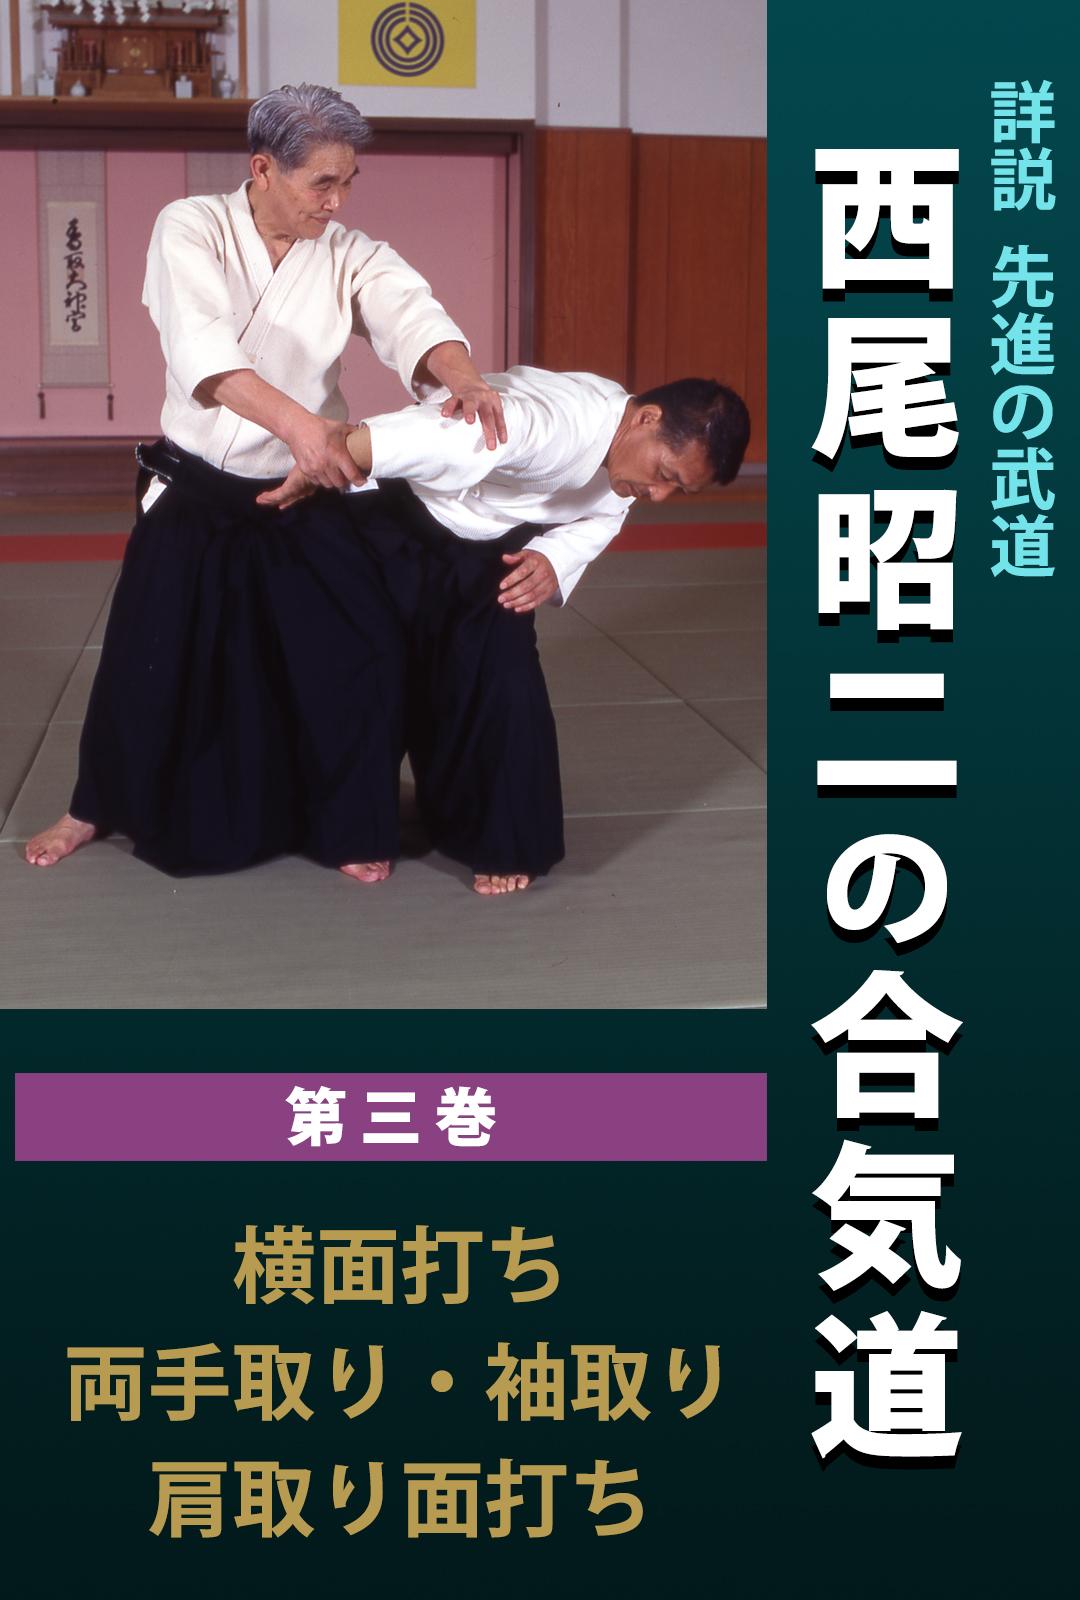 西尾昭二の合気道3